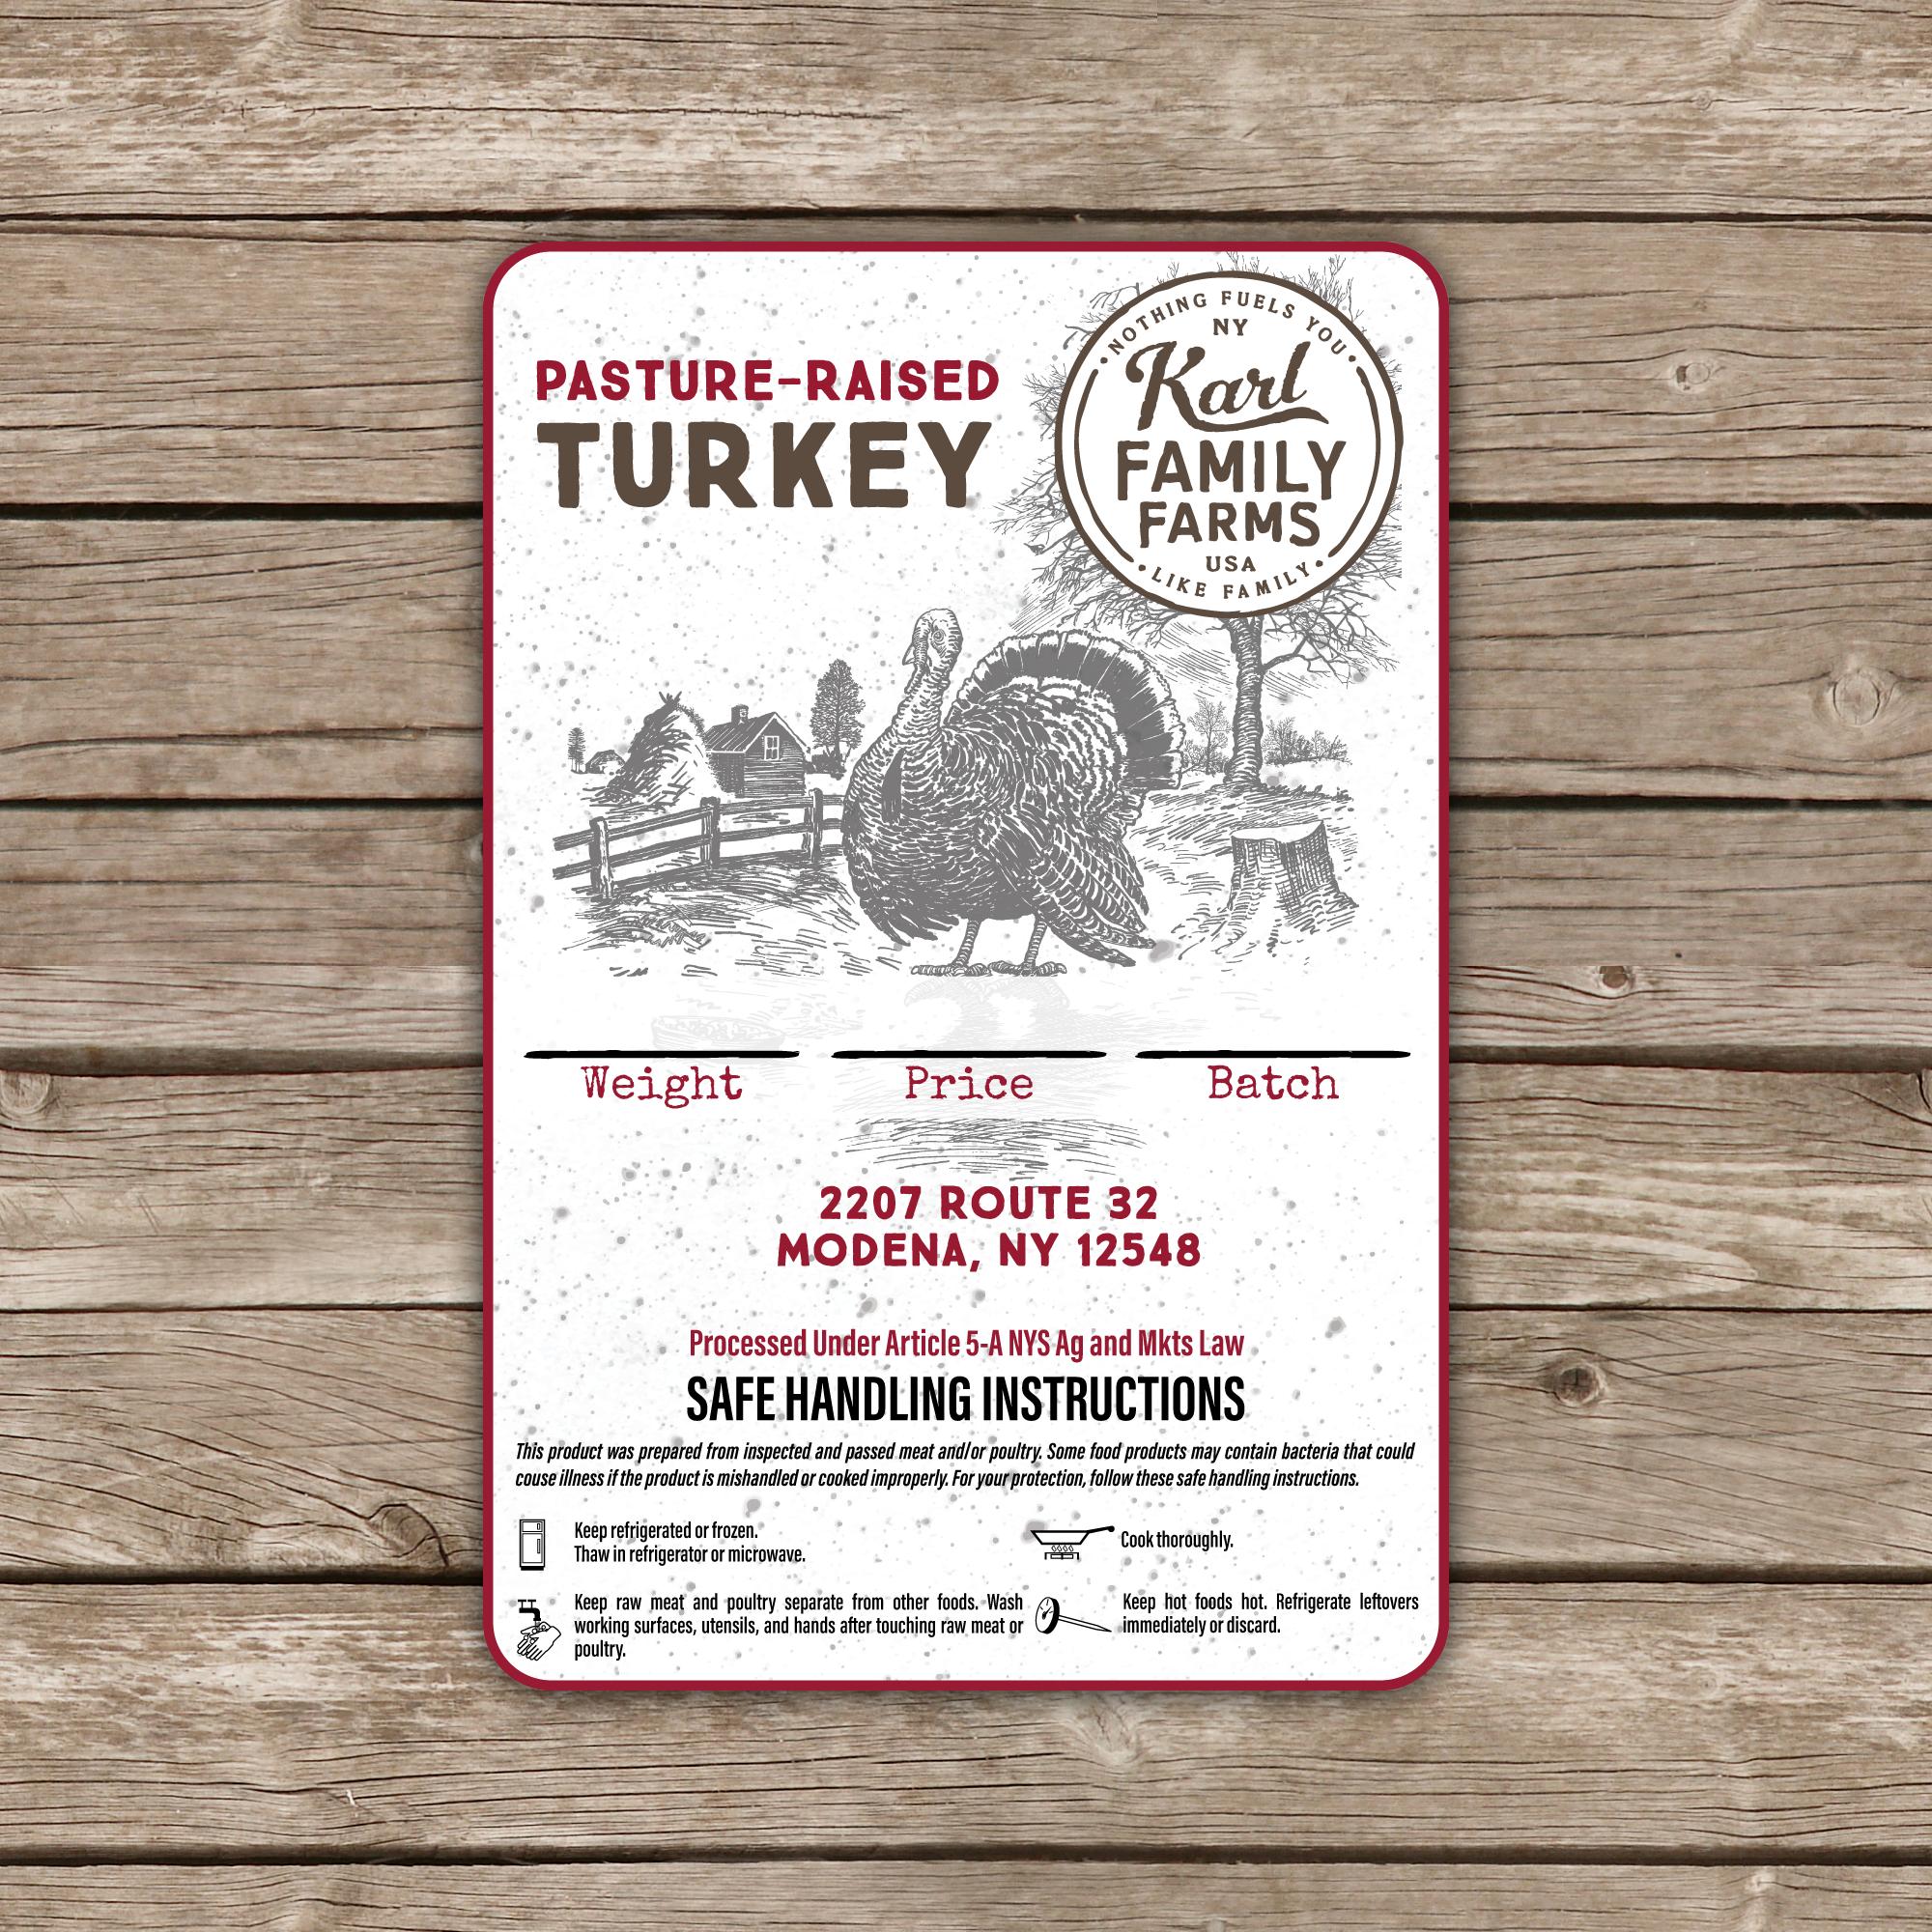 Updated label for fresh turkeys (farm)